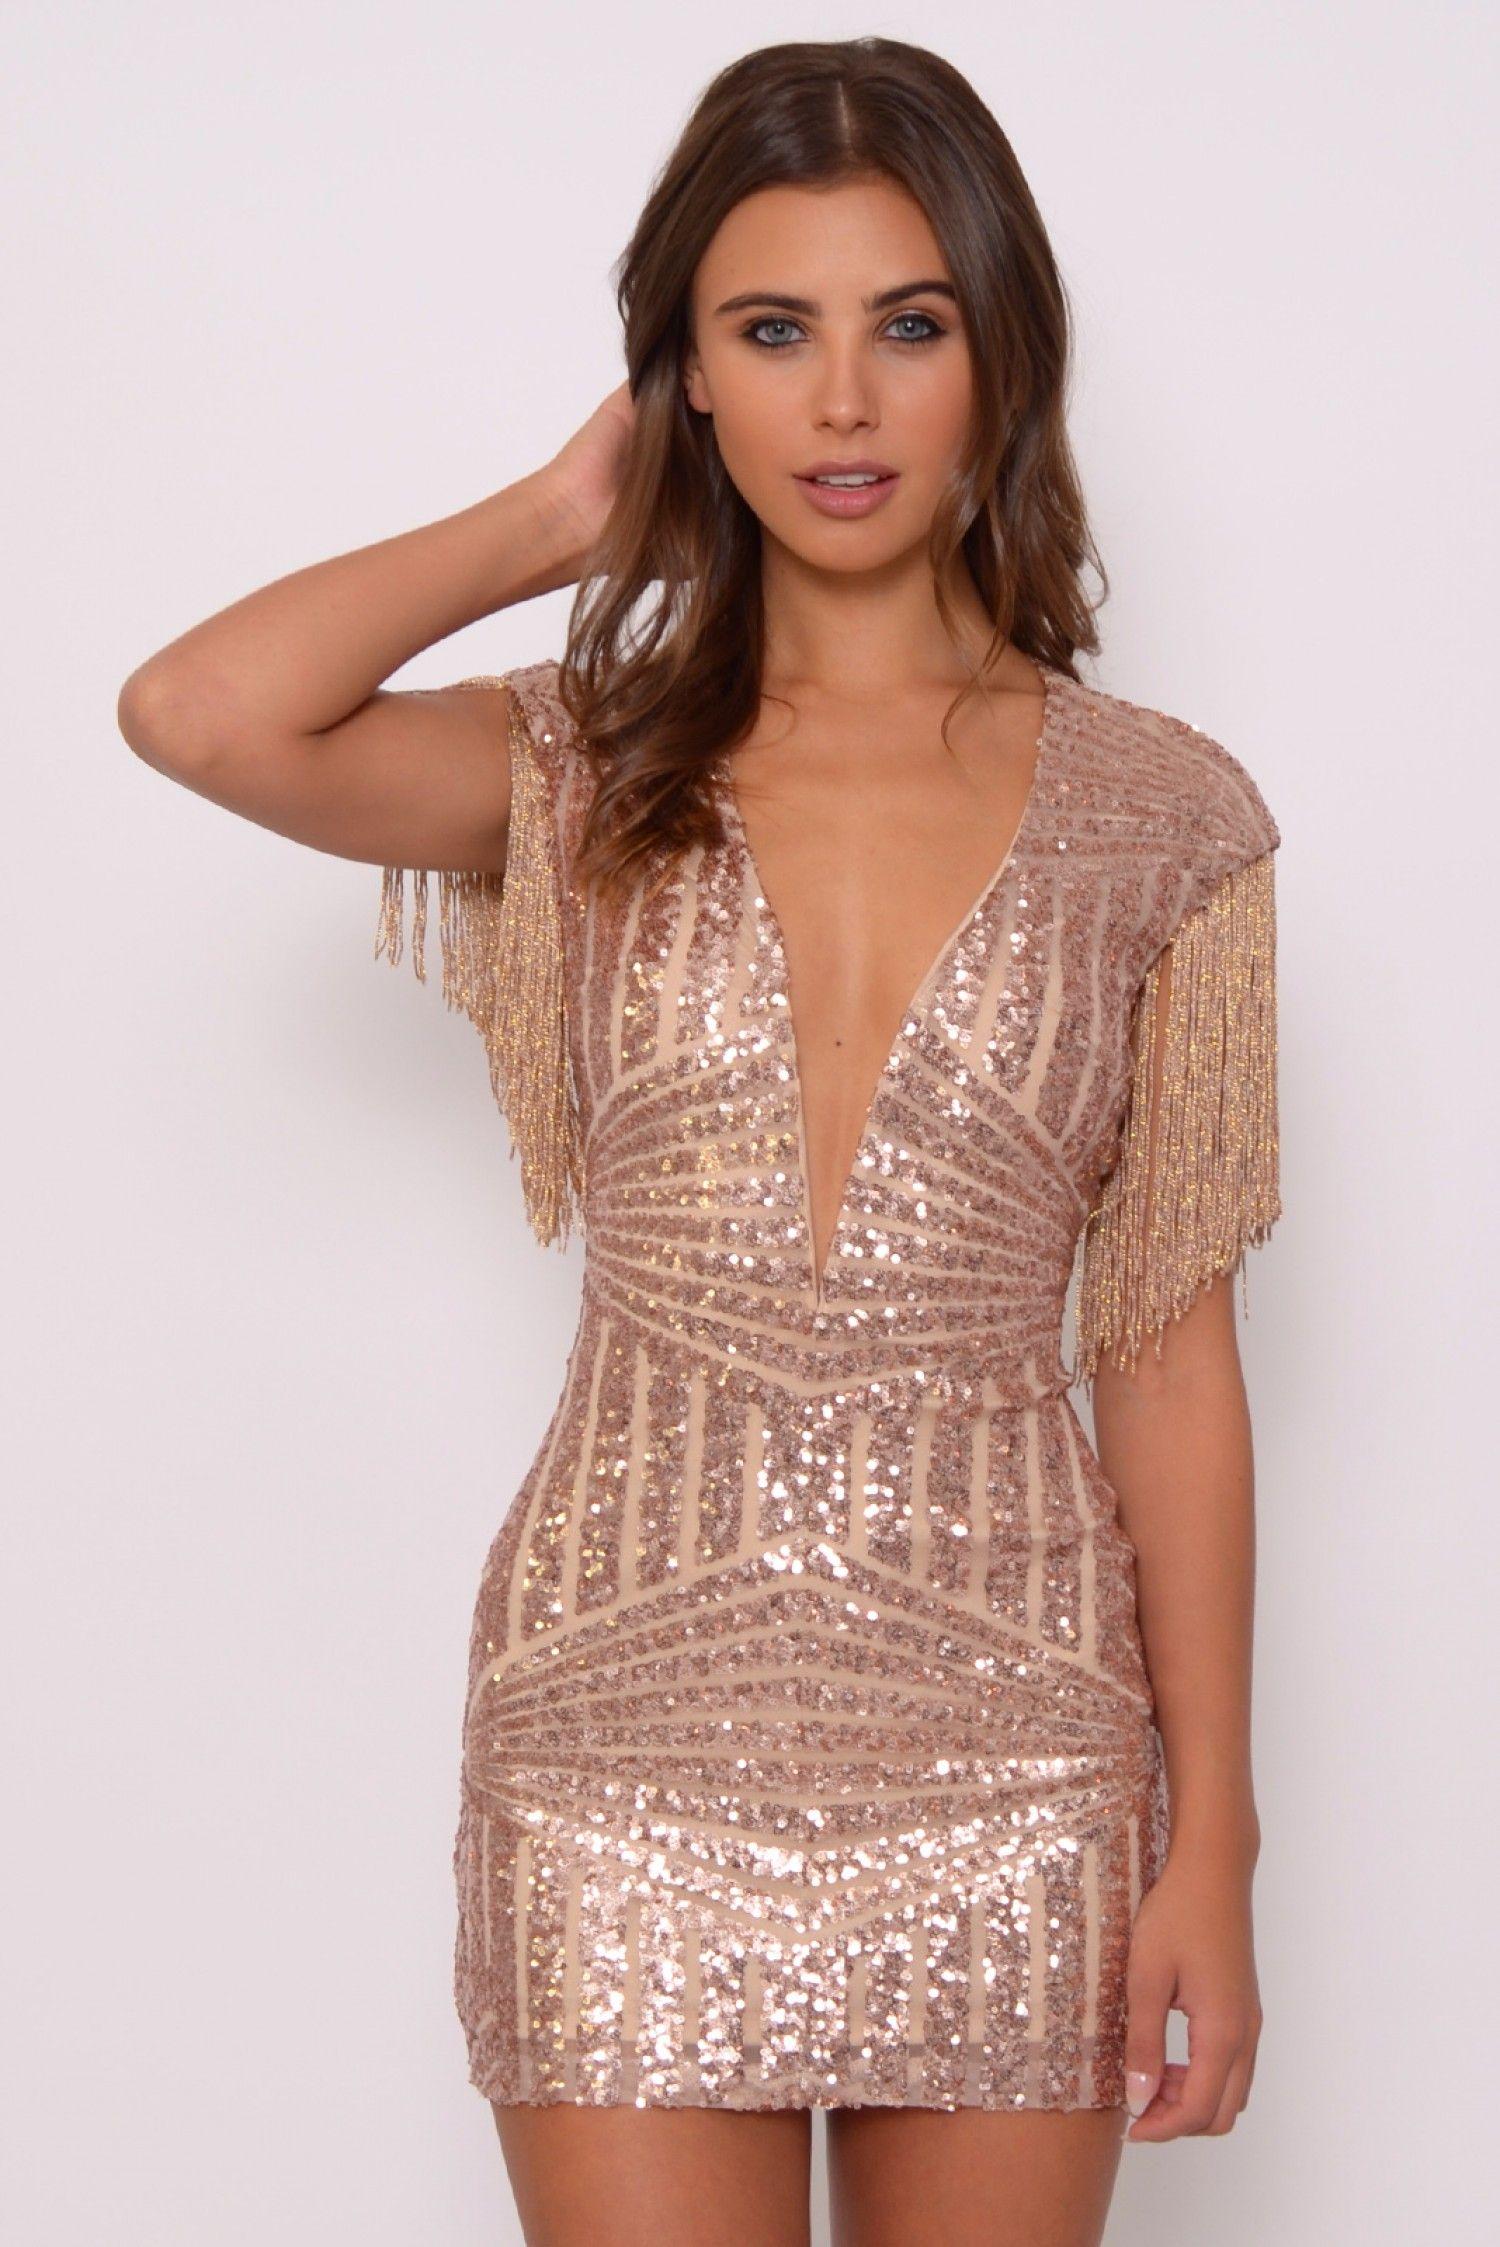 Rose gold sequin and fringe mini dress rare london f o r m a l